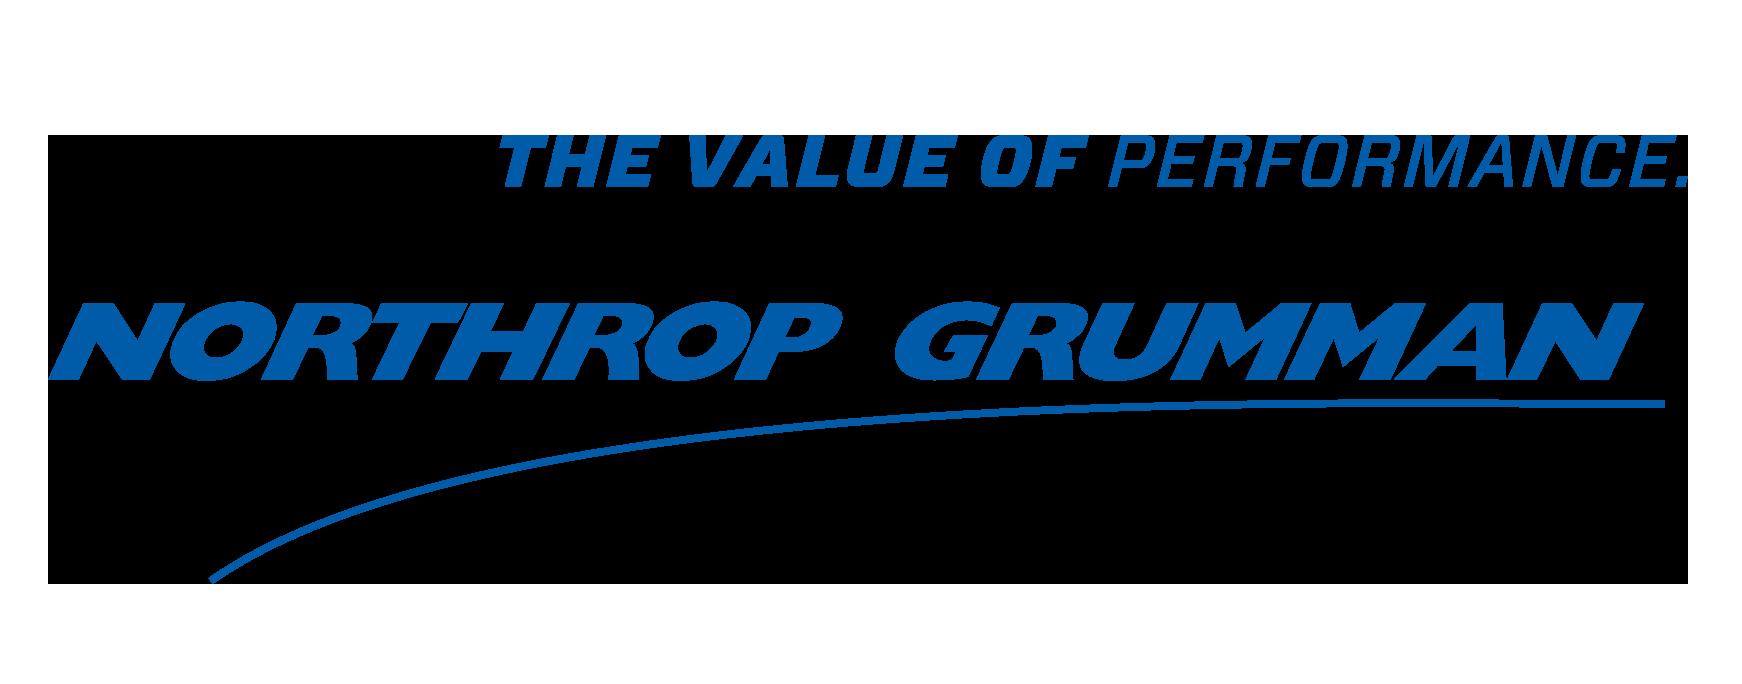 Northrop Grumman - Maritime